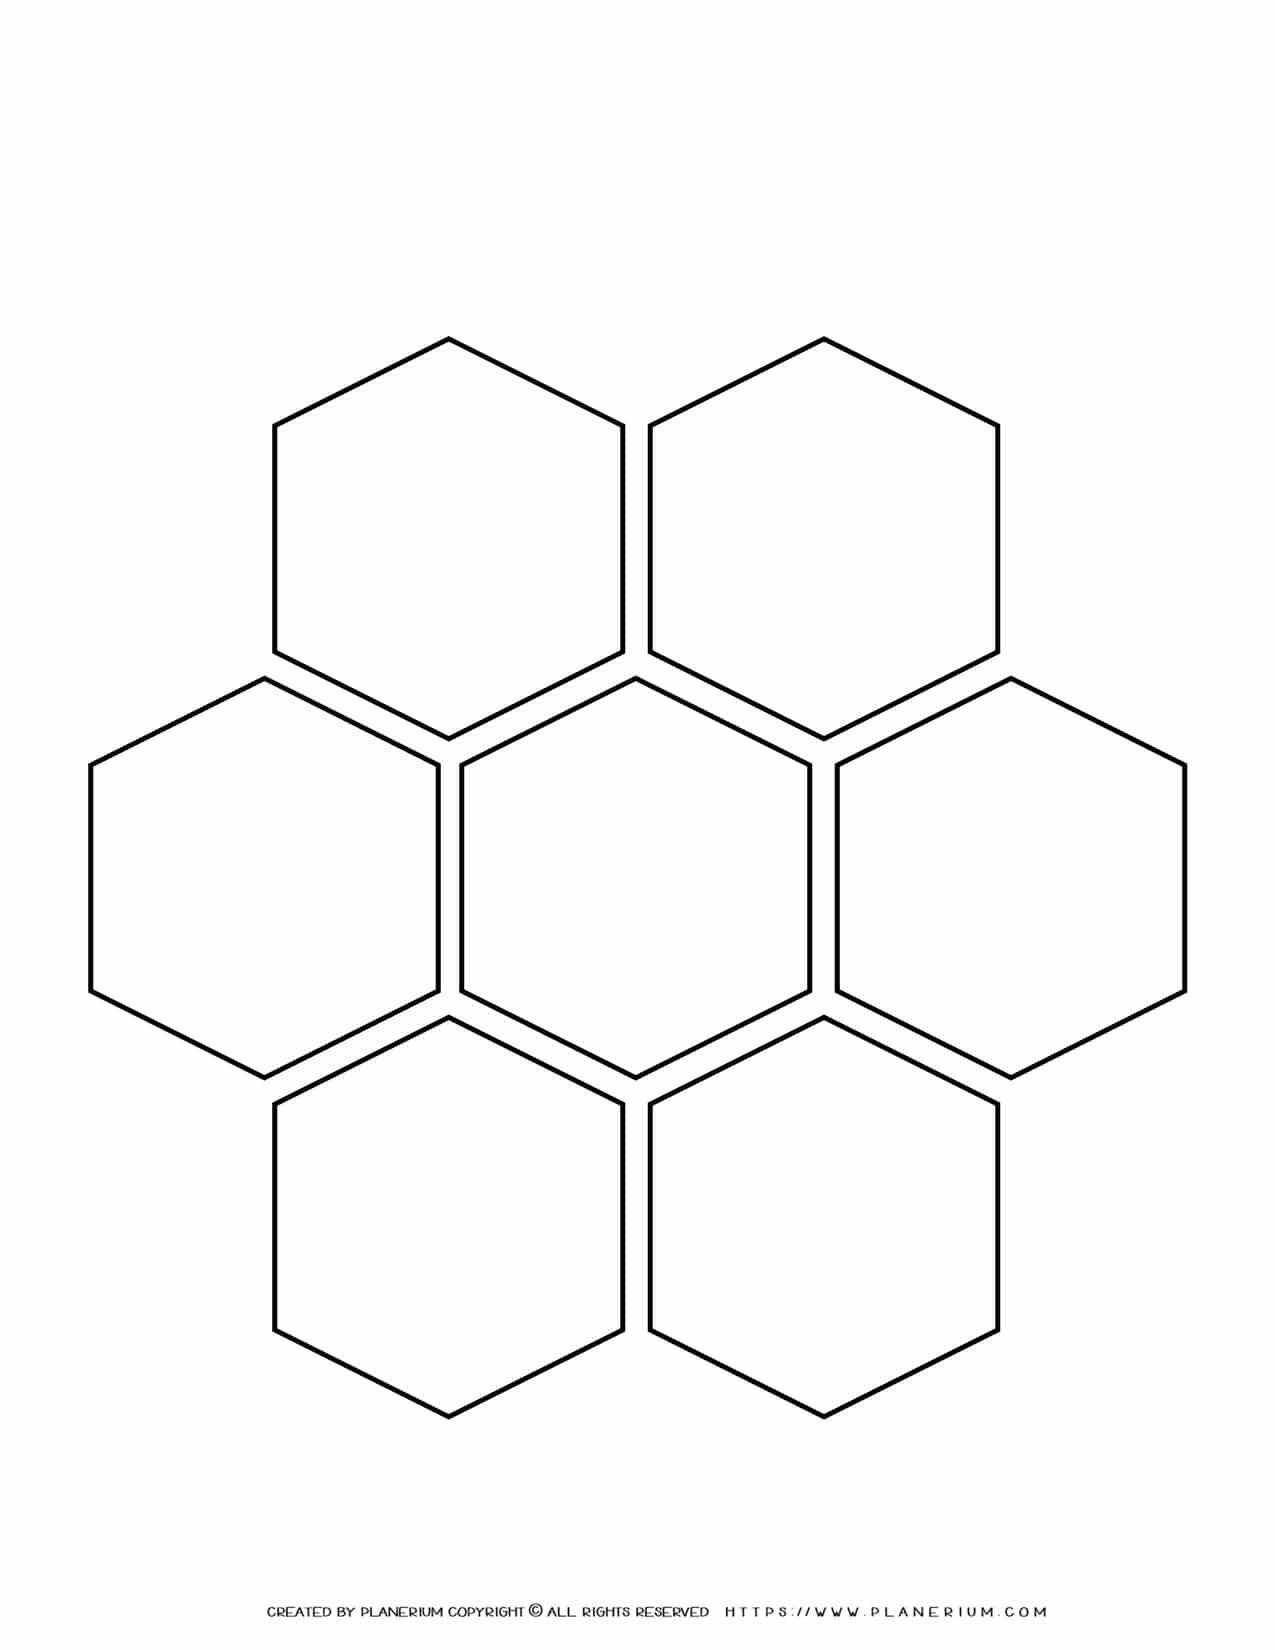 Mind Map Template - Alternatives - Hexagons   Planerium